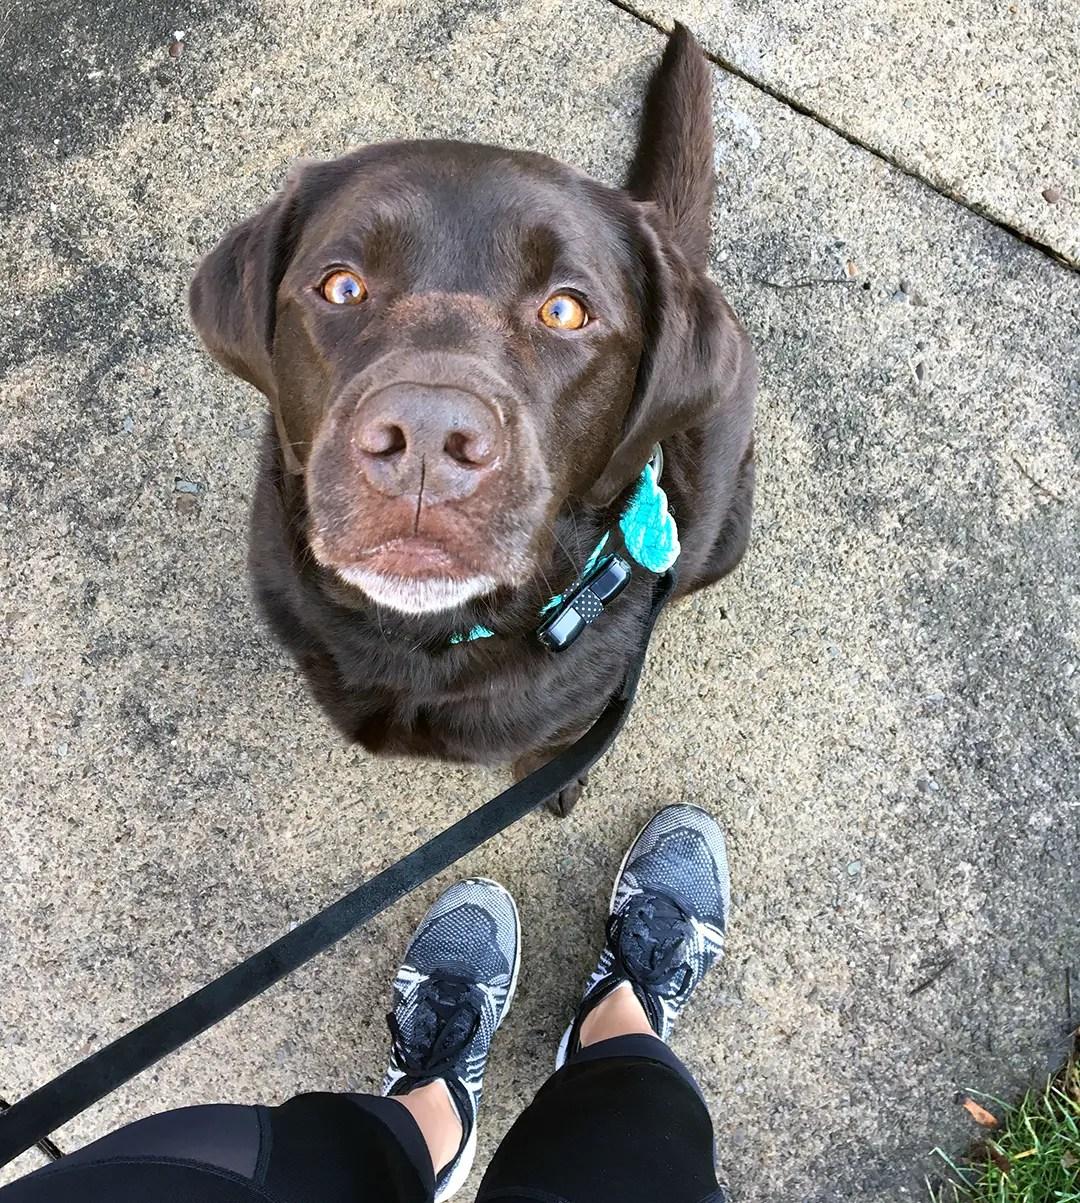 WonderWoof Dog Activity Tracker from The Grommet